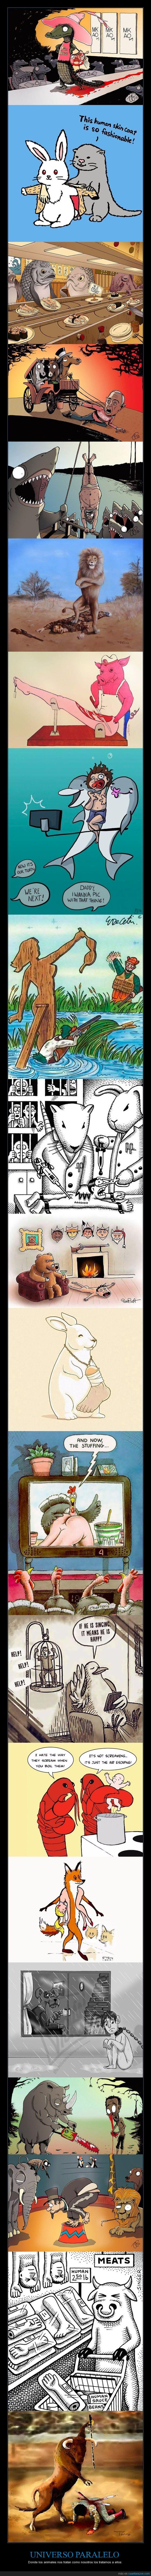 animales,crueldad,paralelo,personas